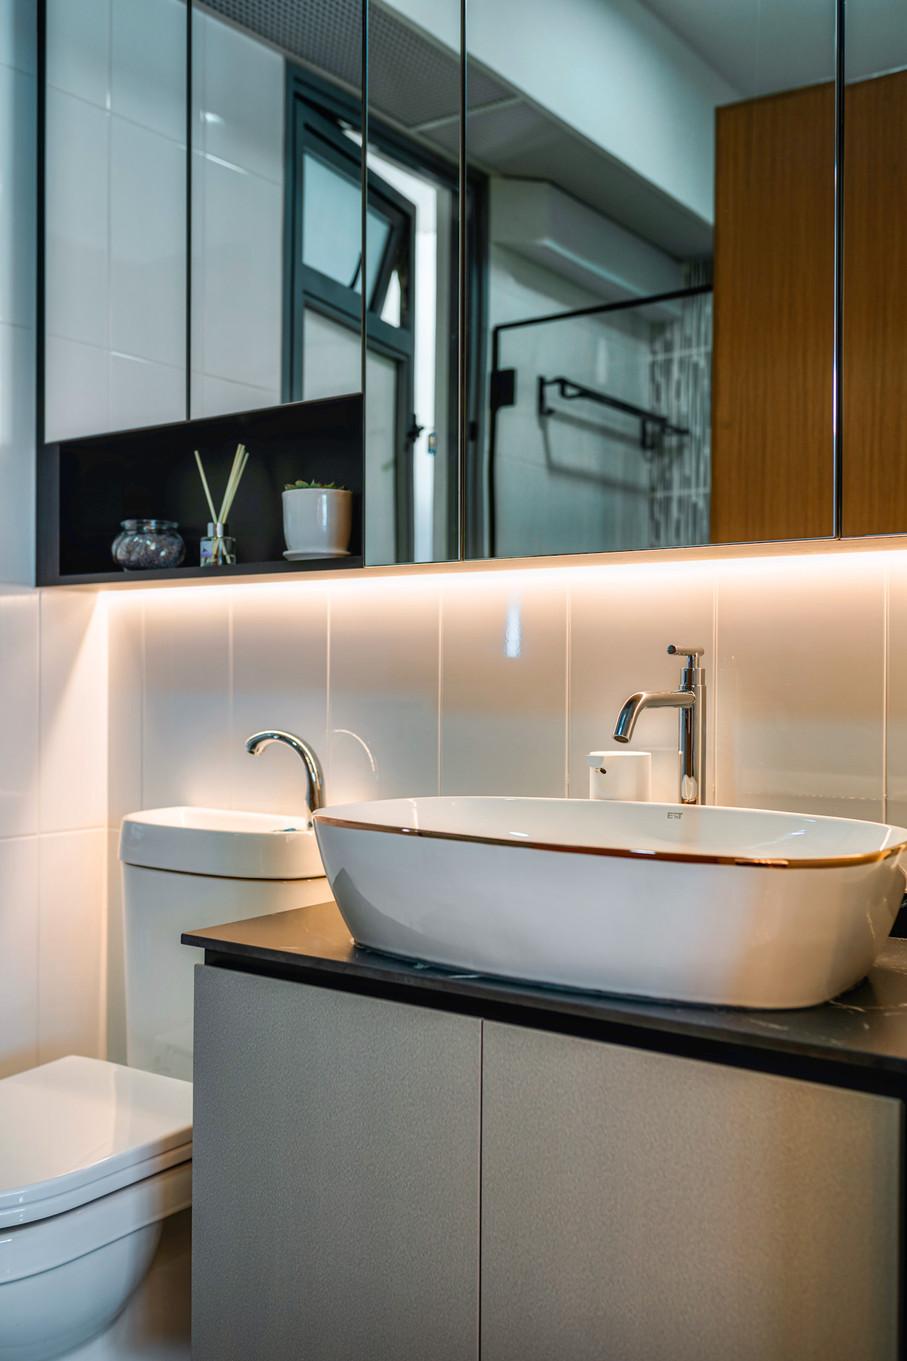 Strathmore Ave | Bathroom